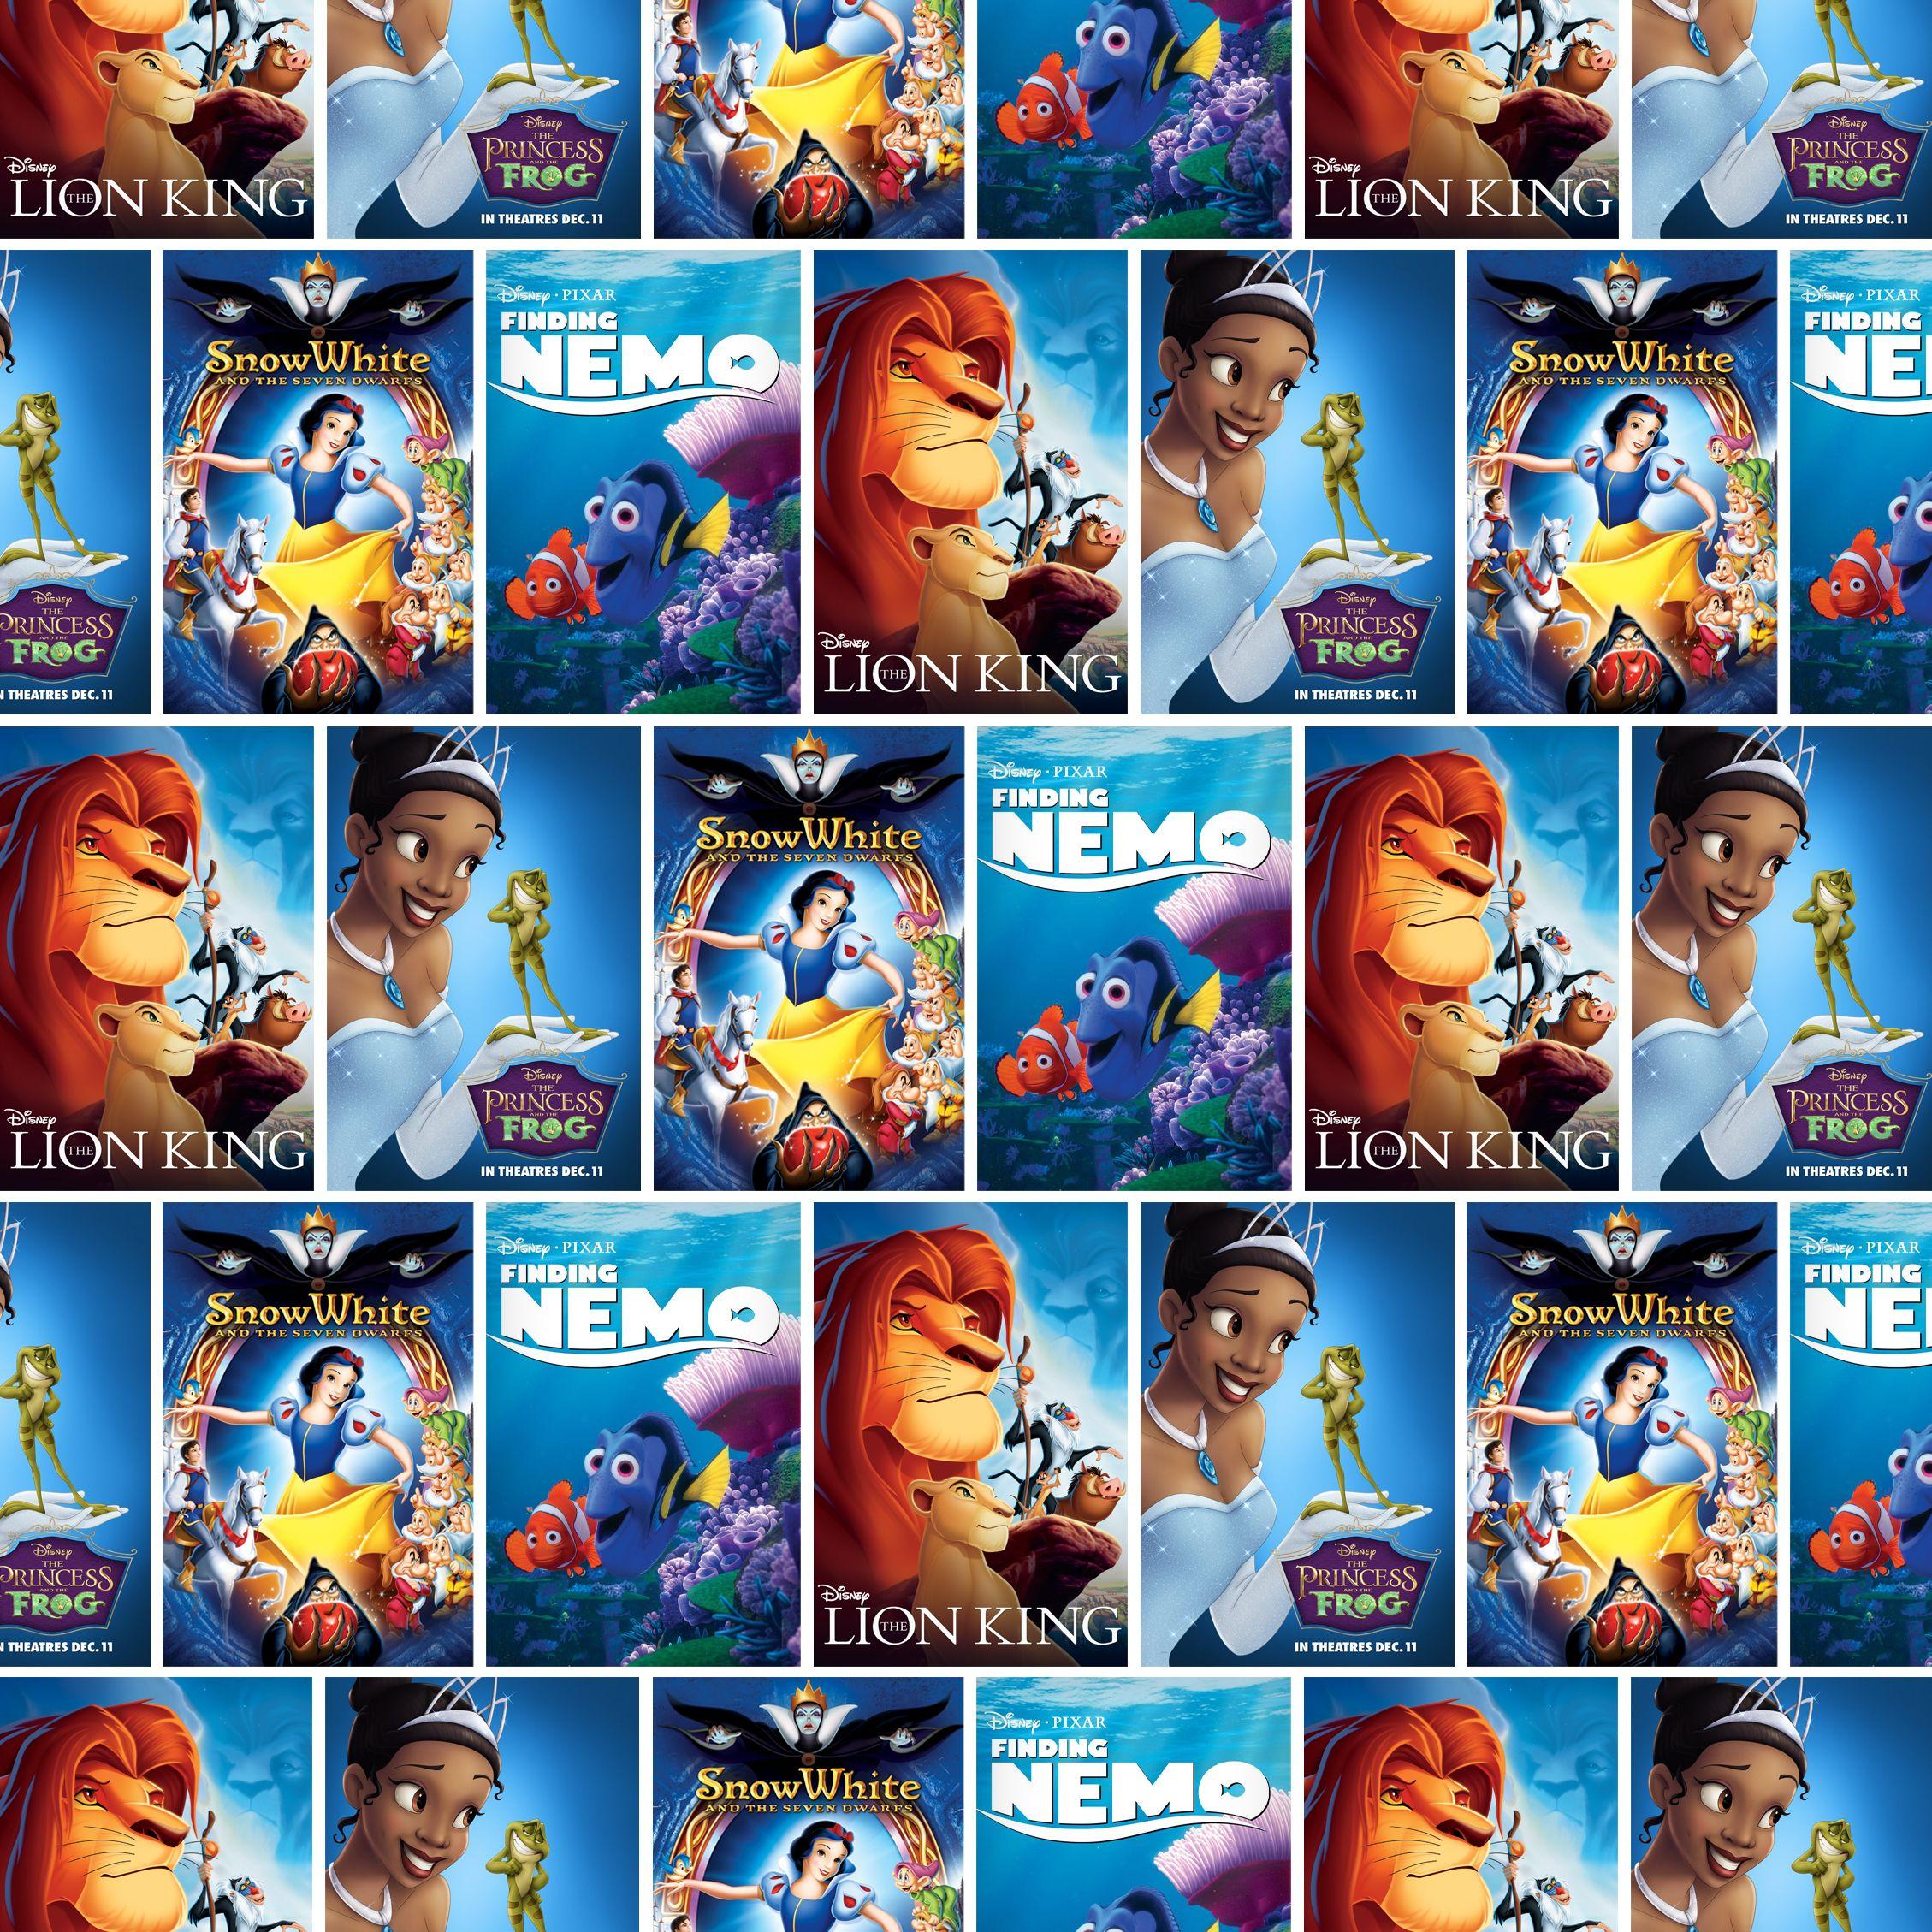 13 Best Disney Movies to Stream Now — Top Disney Classics to Stream on Disney Plus